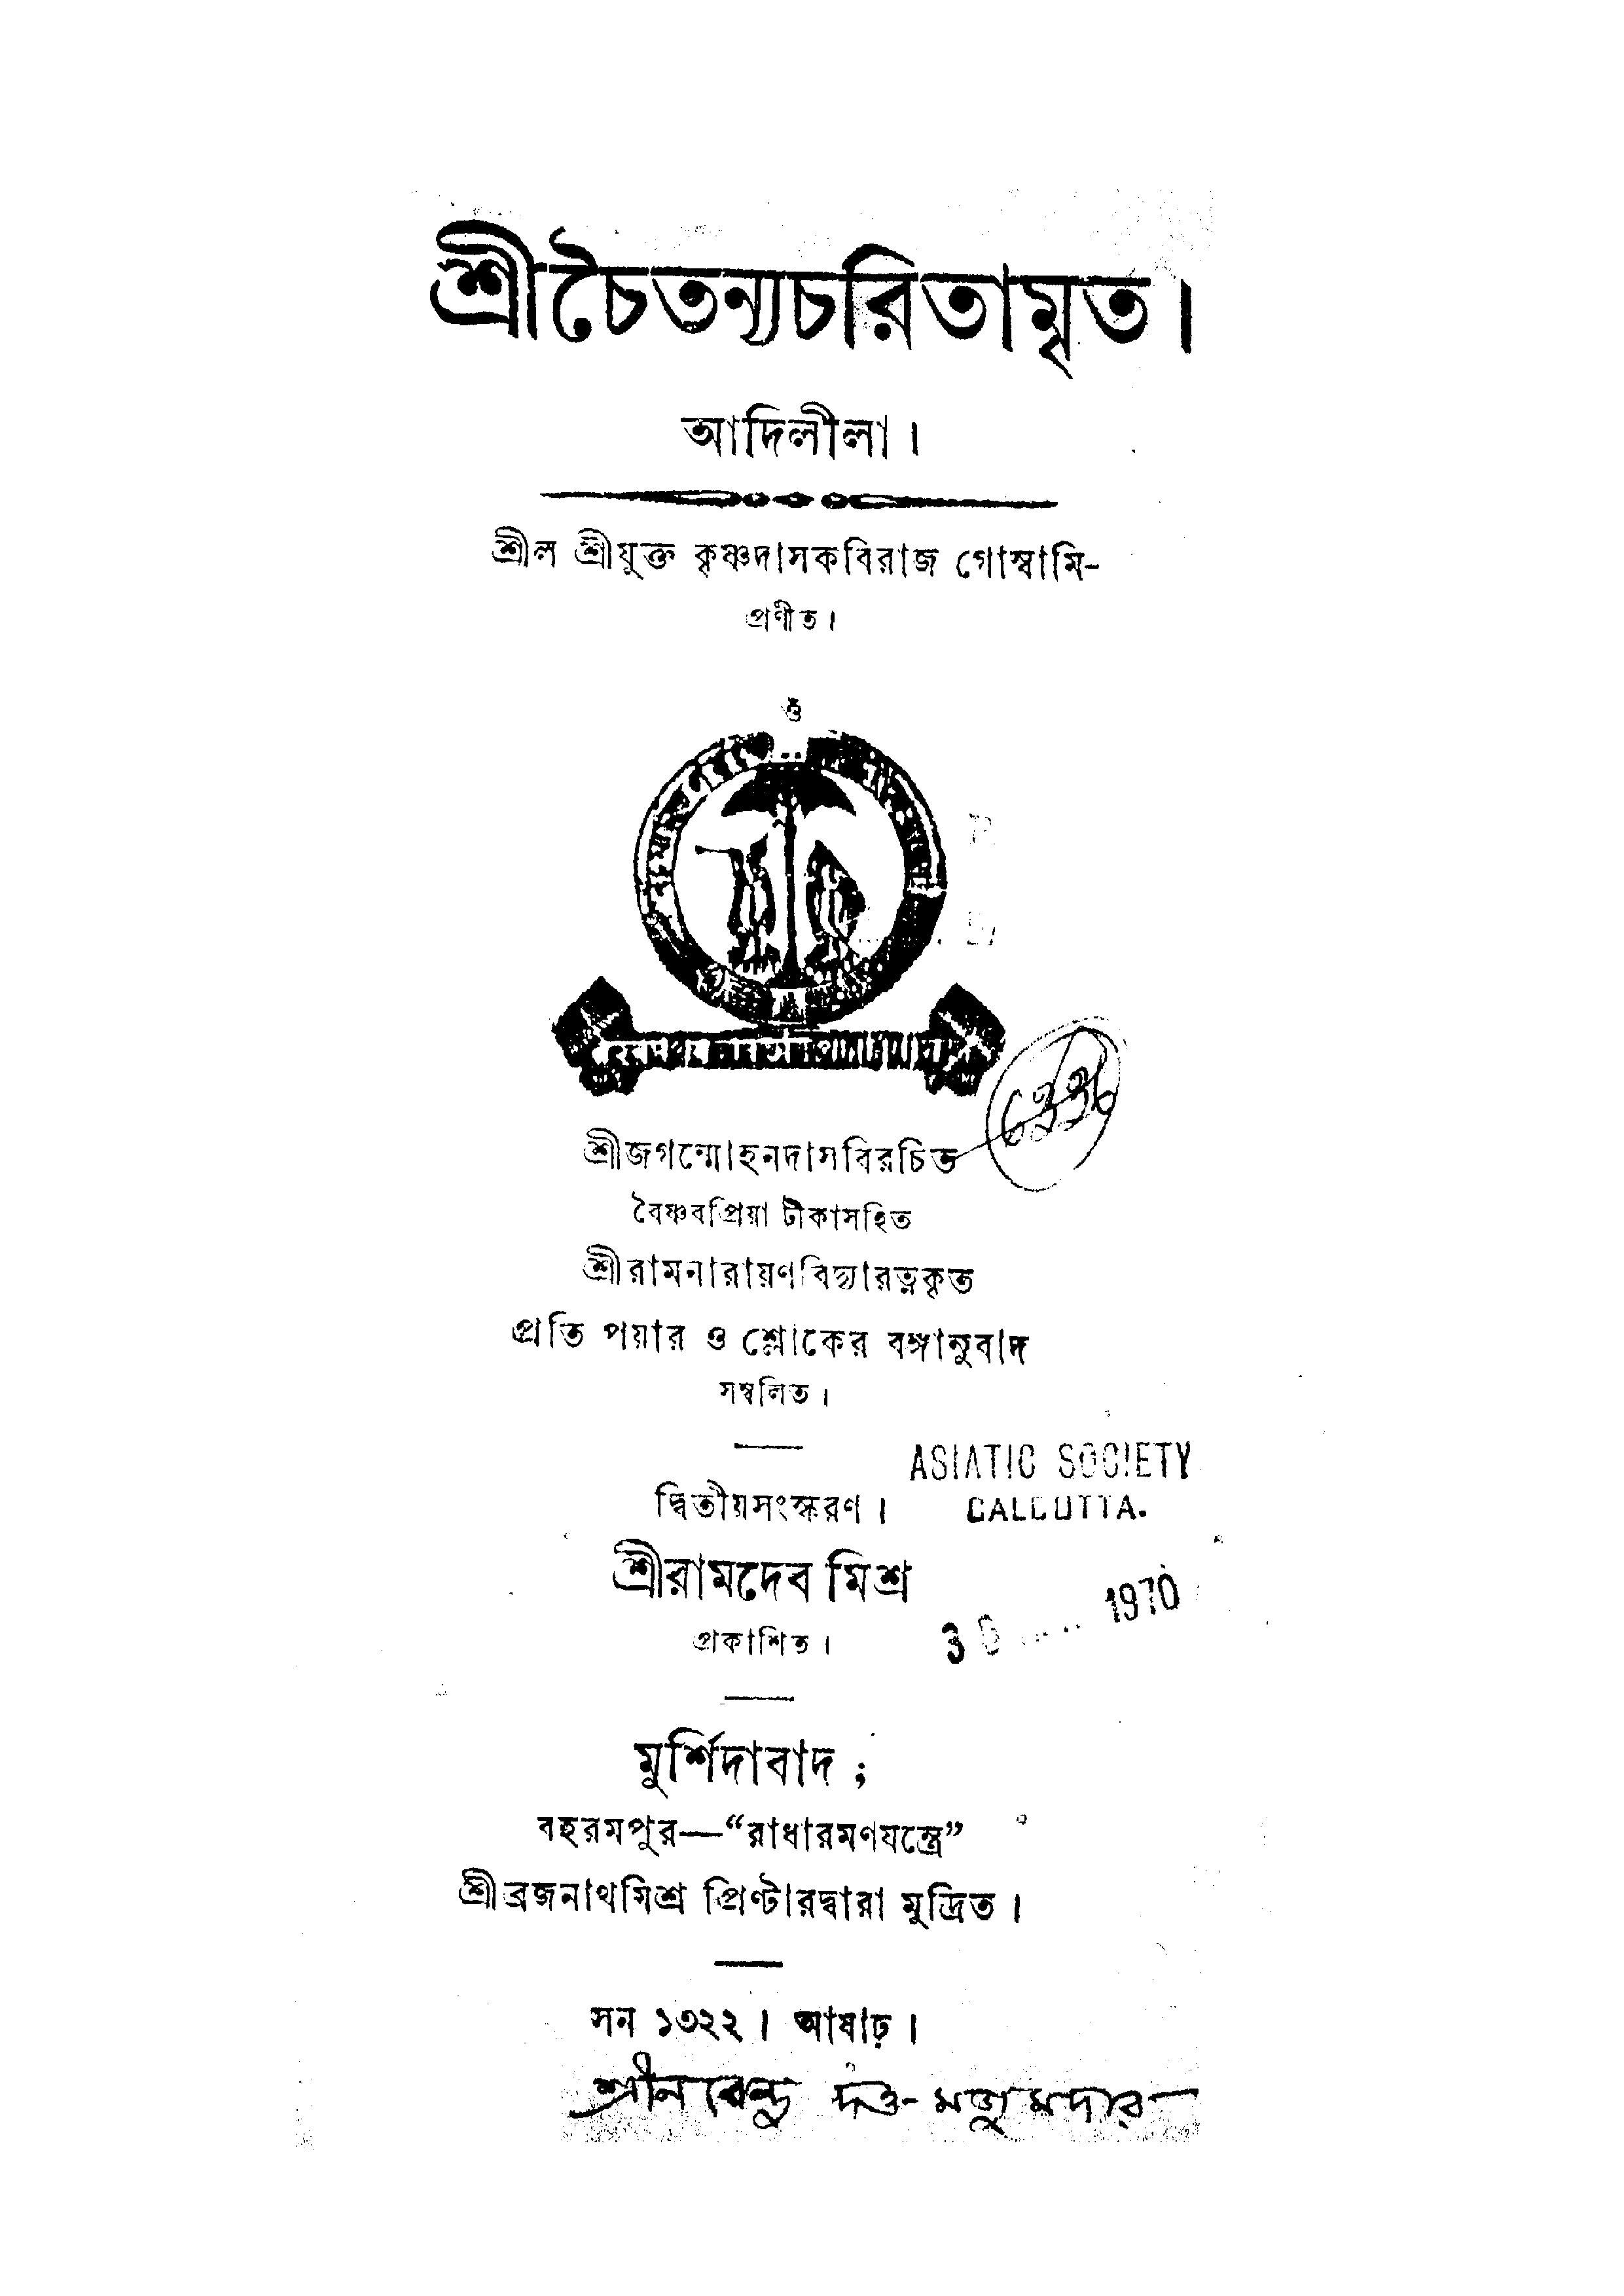 Sri Caitanya Caritamrta - One Volume Edition: Adi-Lila, Madhya-Lila and Antya-Lila